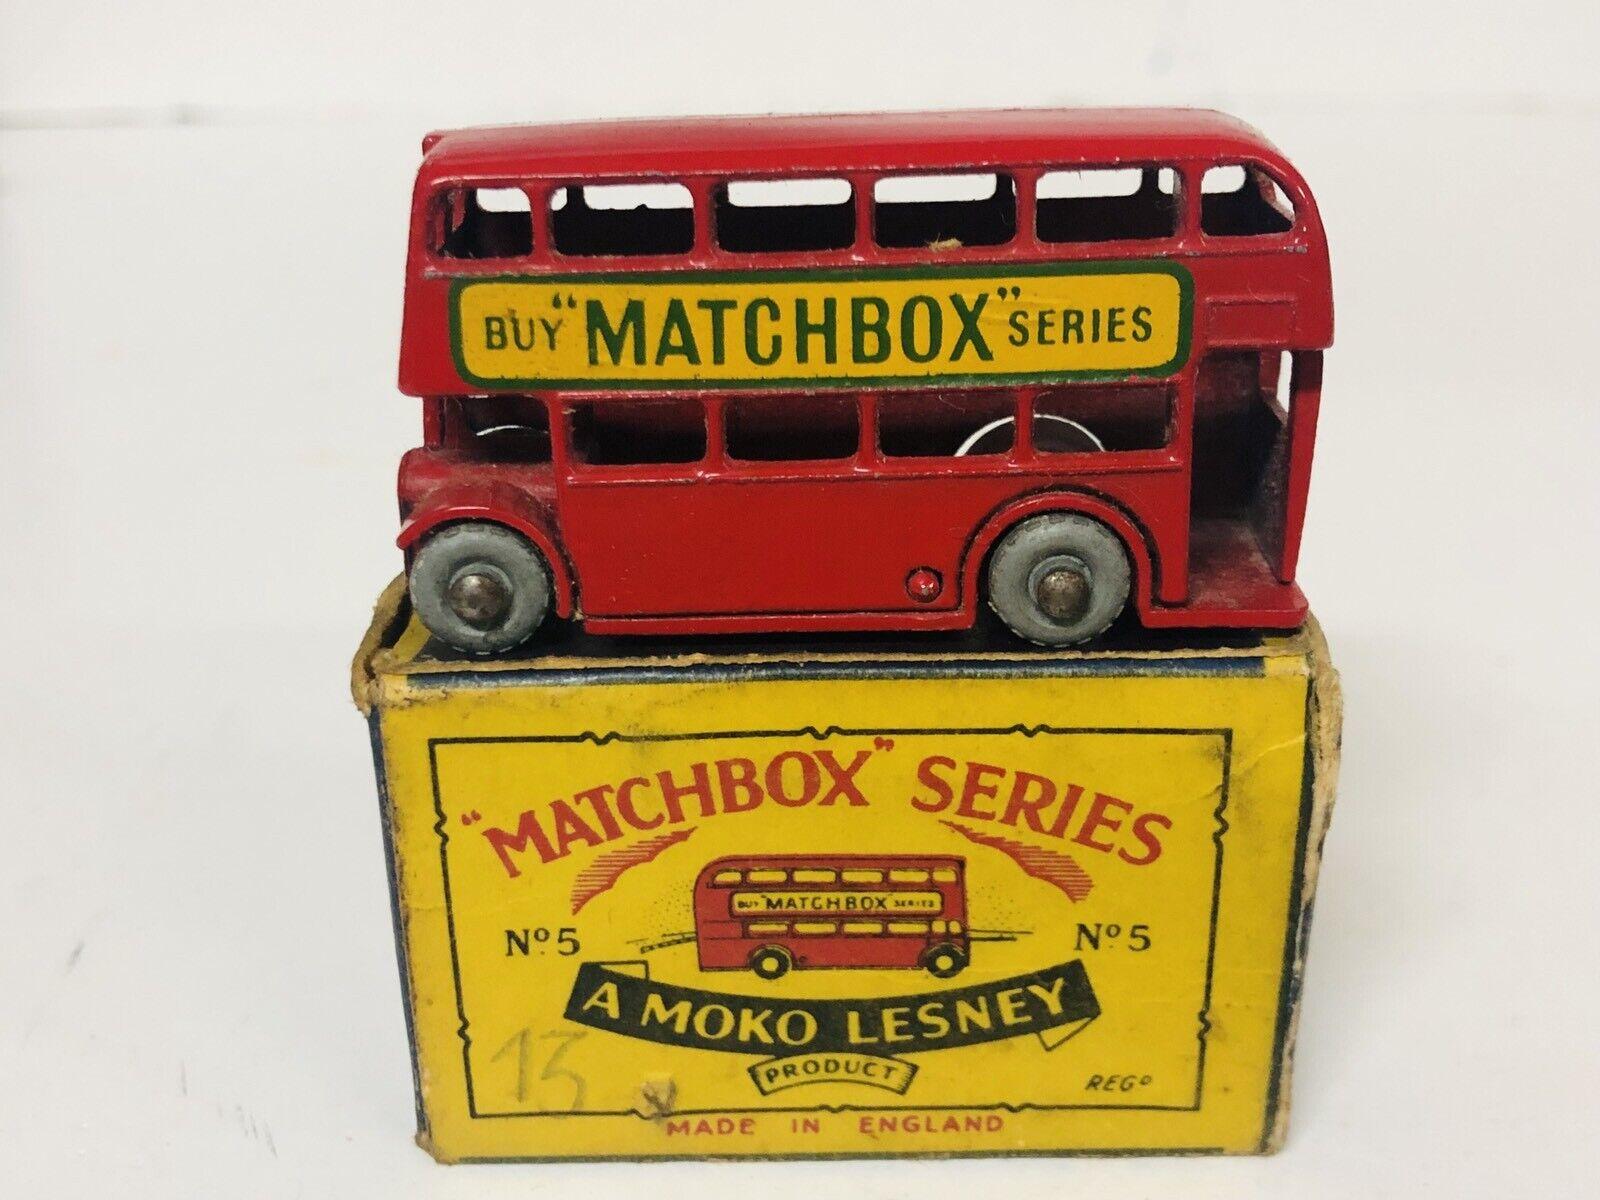 Moko Lesney Matchbox 5b London Bus Buy Matchbox Series Con Caja Original